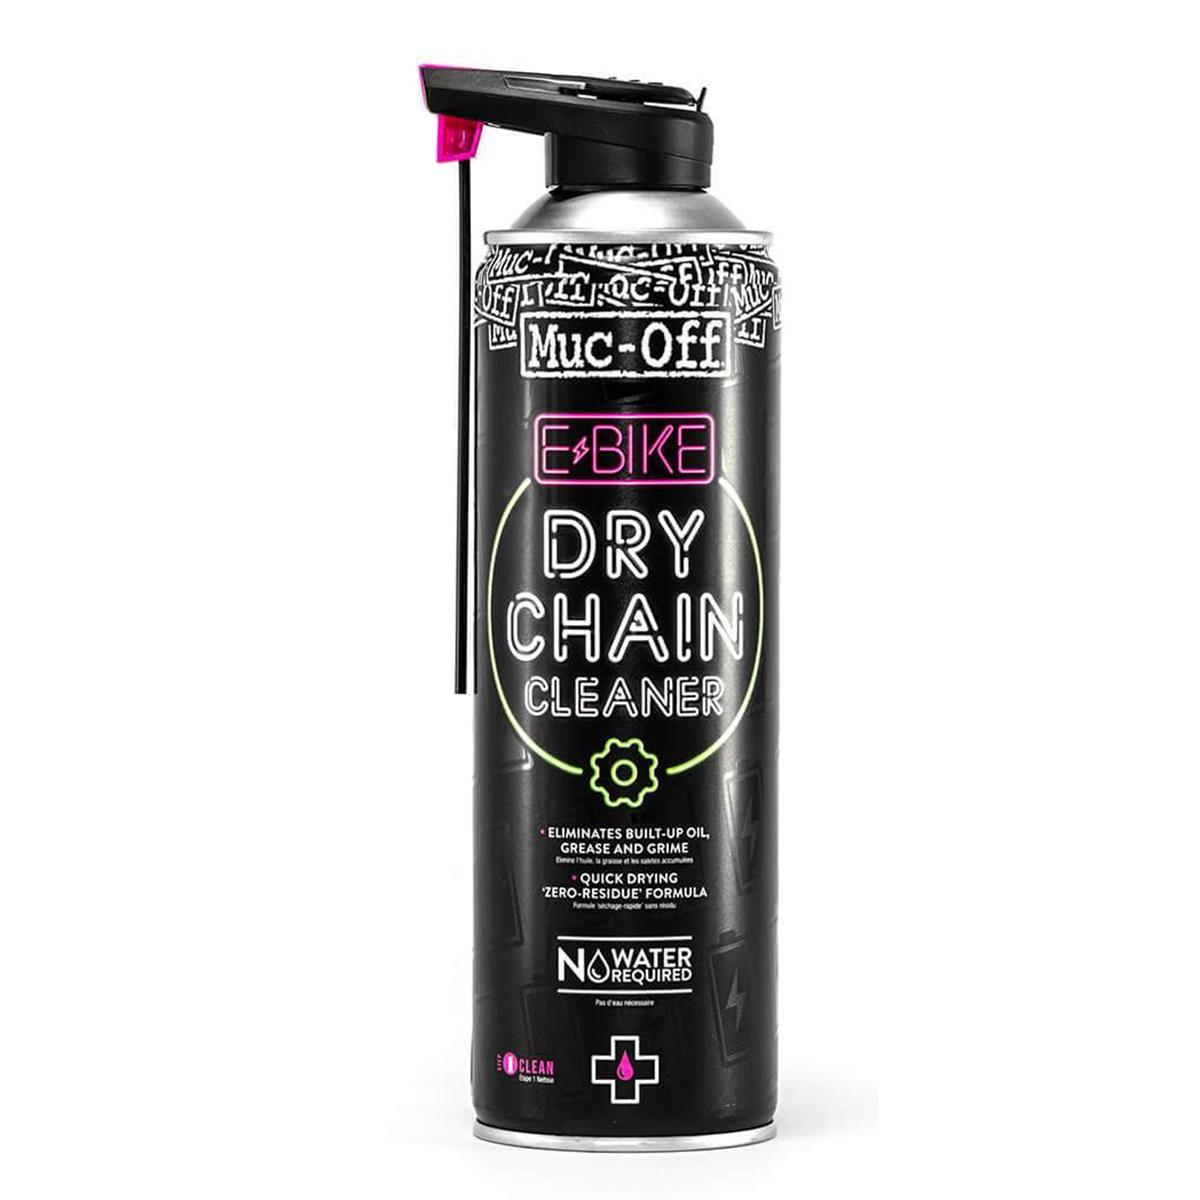 Muc-Off Kettenreiniger E-Bike Dry Chain Cleaner 500 ml